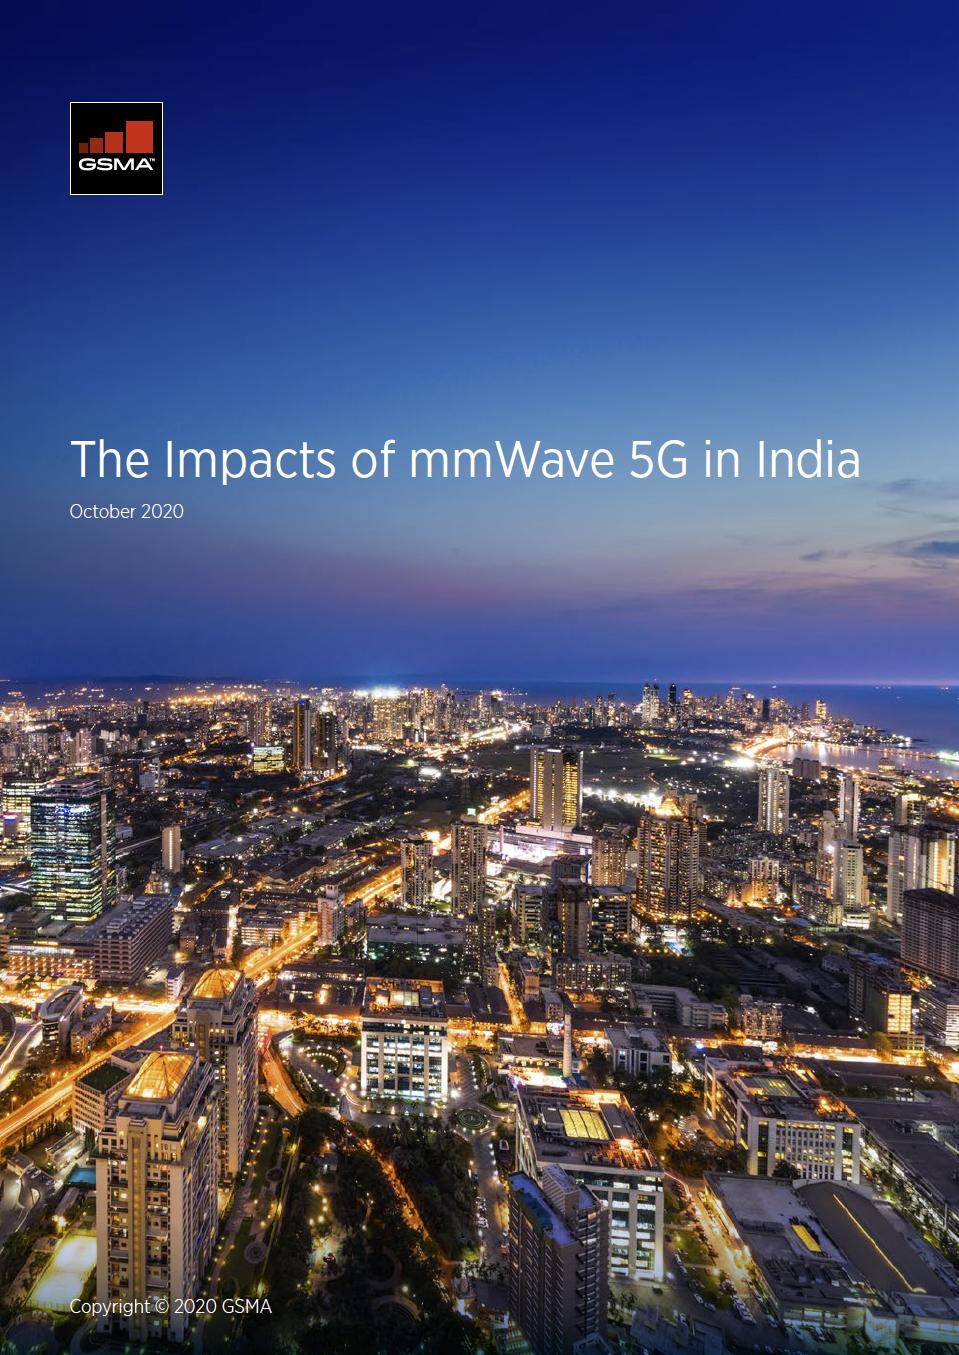 mmWave 5G in India – a digital cornerstone image